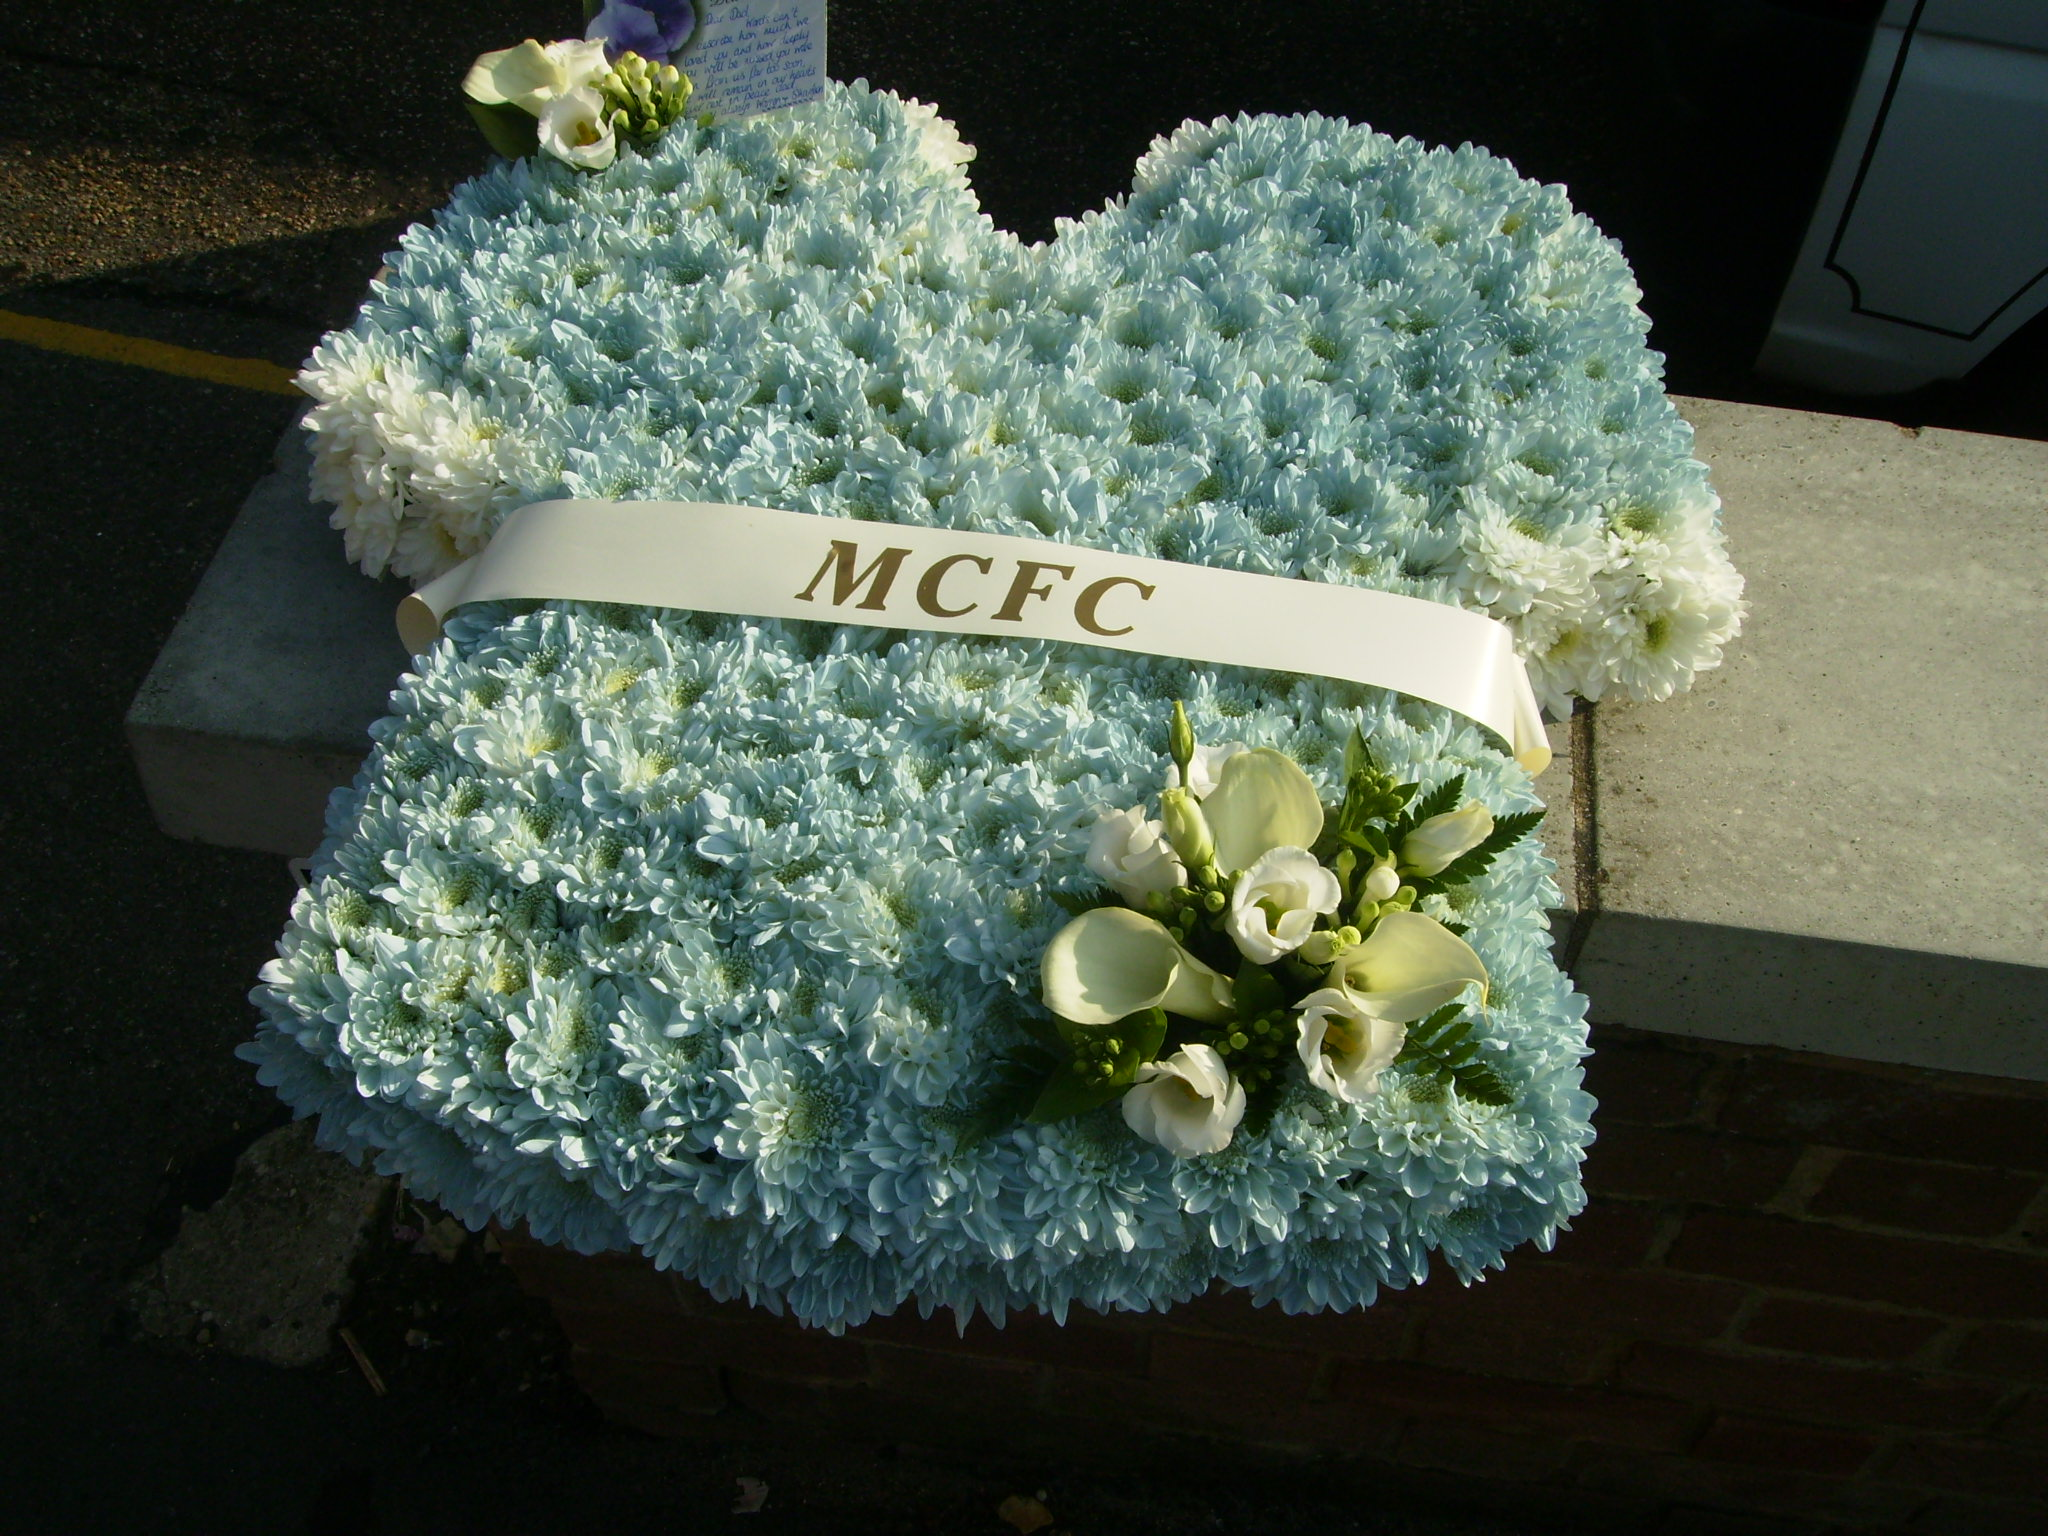 Unusual tributes football shirt fleurtations flowers unusual tributes football shirt funeral flowers izmirmasajfo